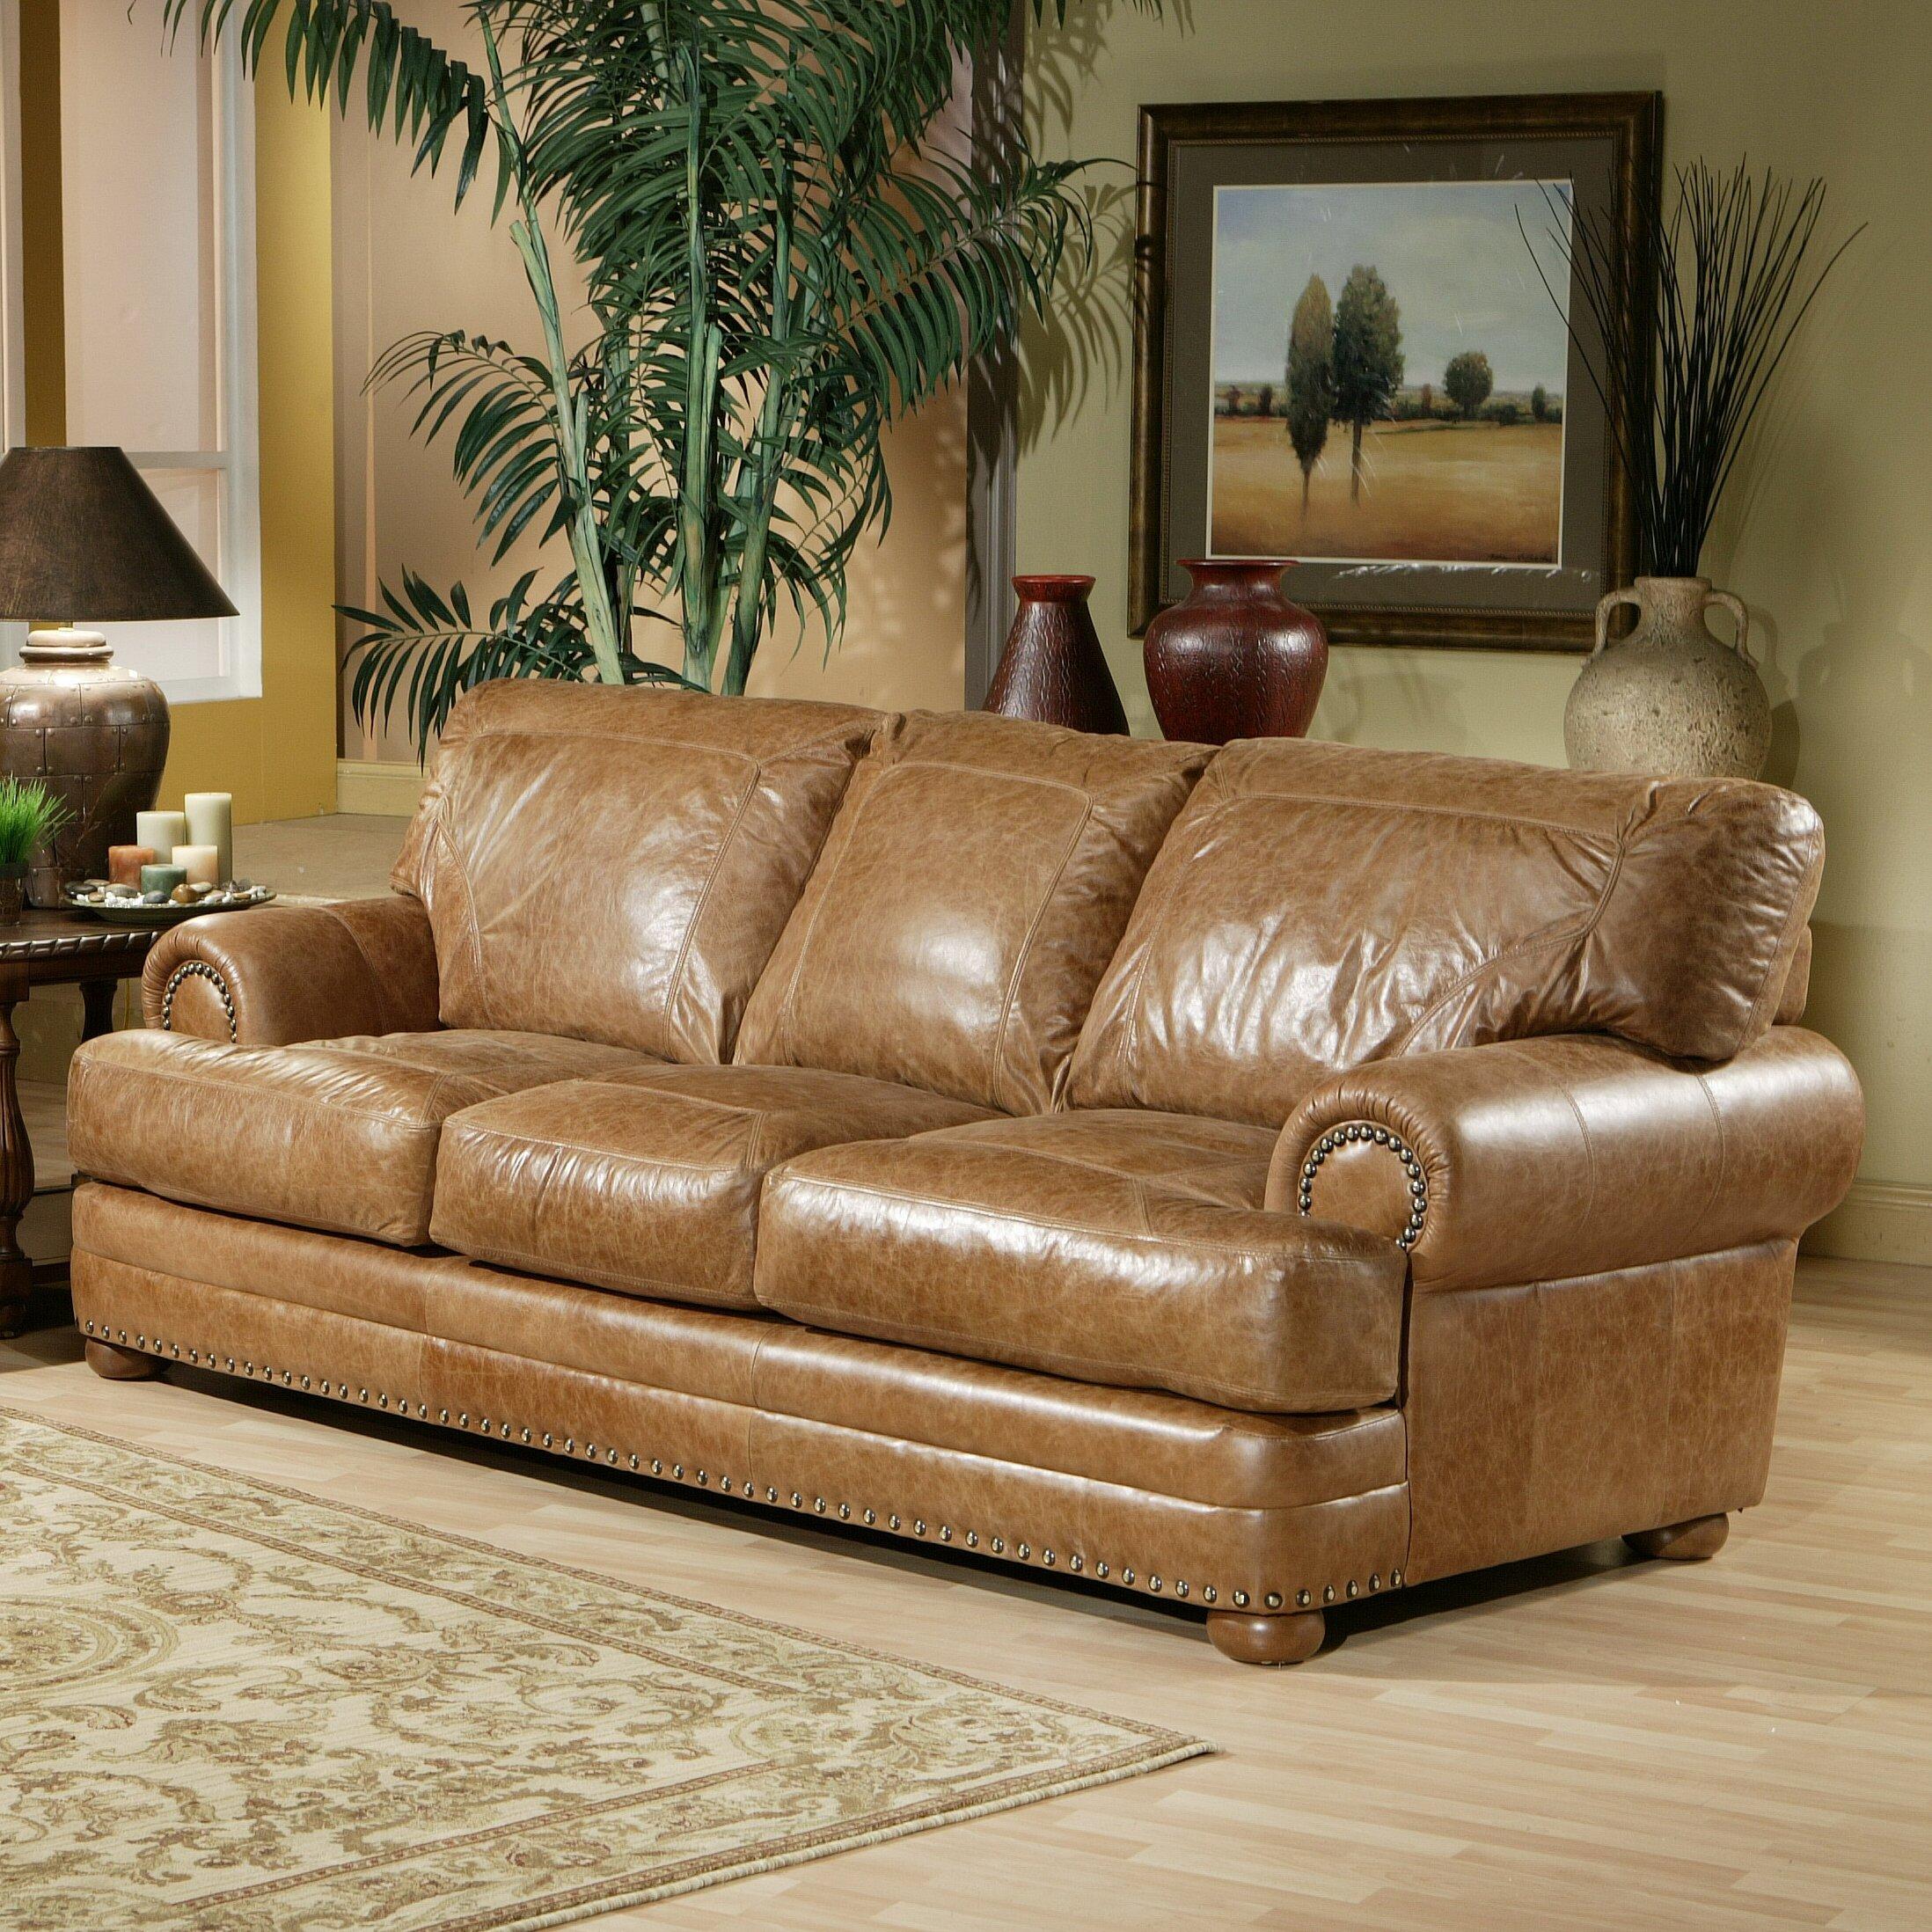 Leather Sofas Reviews: Omnia Leather Houston Leather Sofa & Reviews